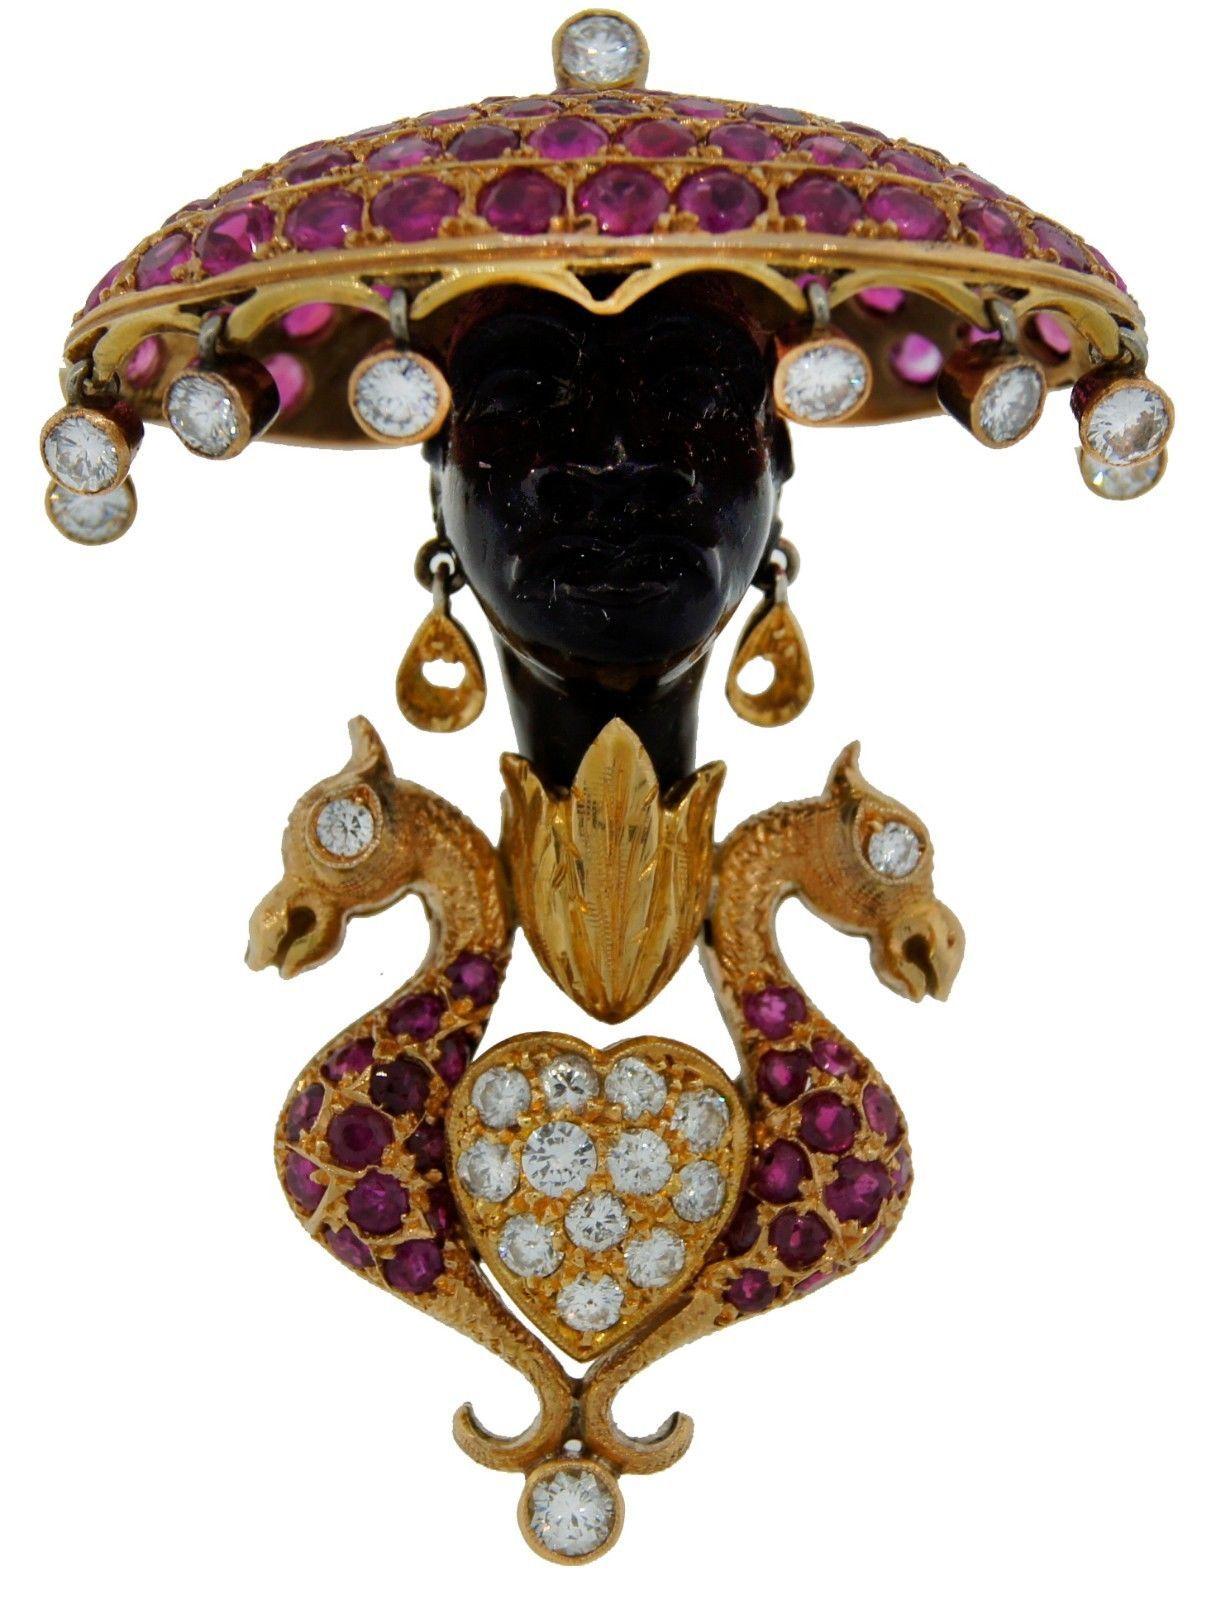 Collectible NARDI c.1950s BLACKAMOOR PIN BROOCH - DIAMOND RUBY ONYX YELLOW GOLD